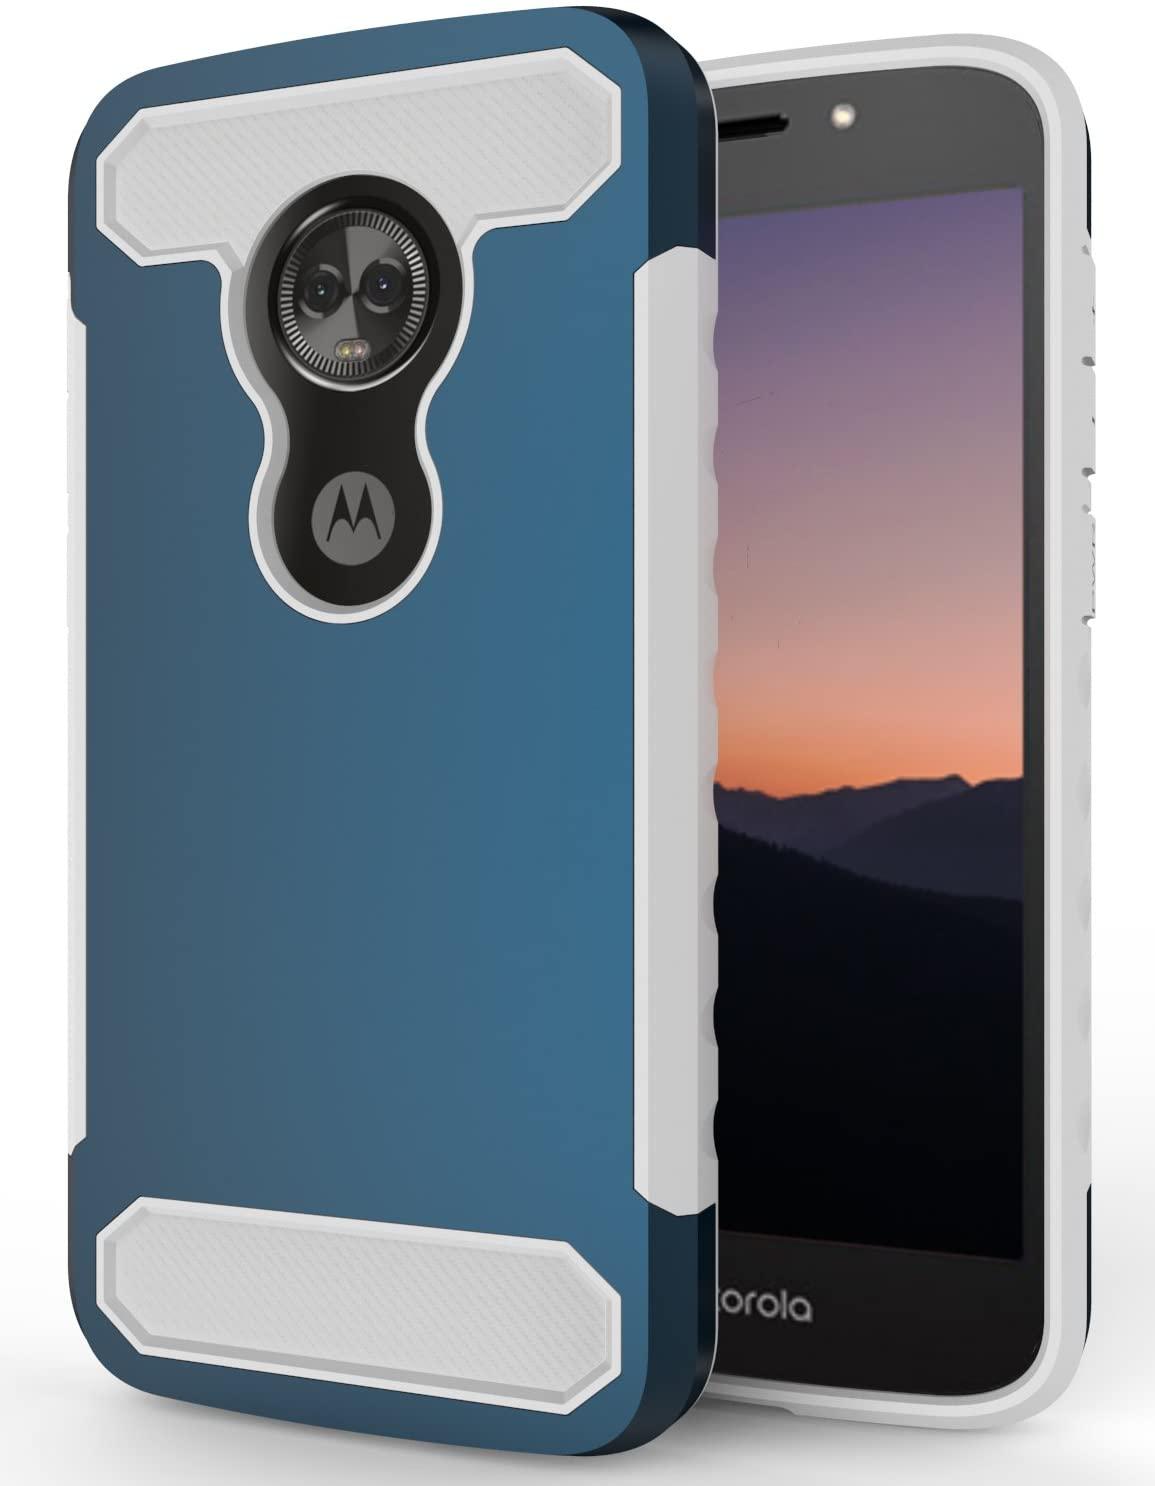 Moto E5 Play Case, Moto E5 Cruise Case, SENON Slim-fit Shockproof Anti-Scratch Anti-Fingerprint Protective Case Cover for Motorola Moto E5 Play 2018,Navy